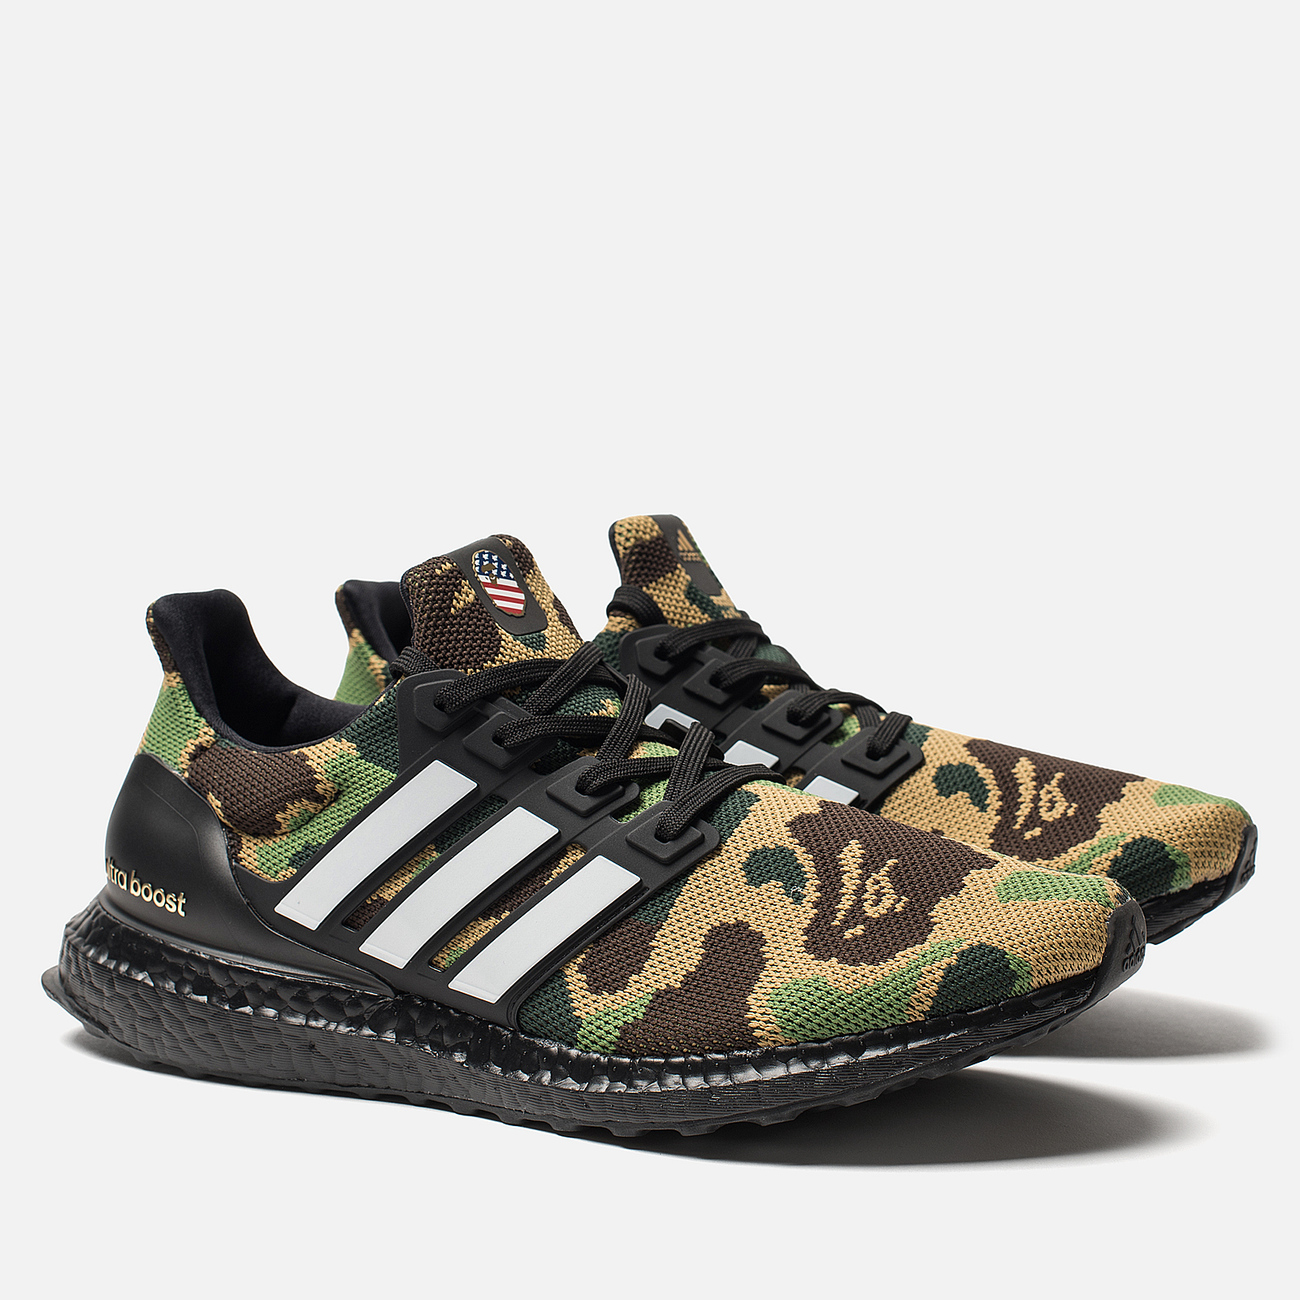 adidas x bape release